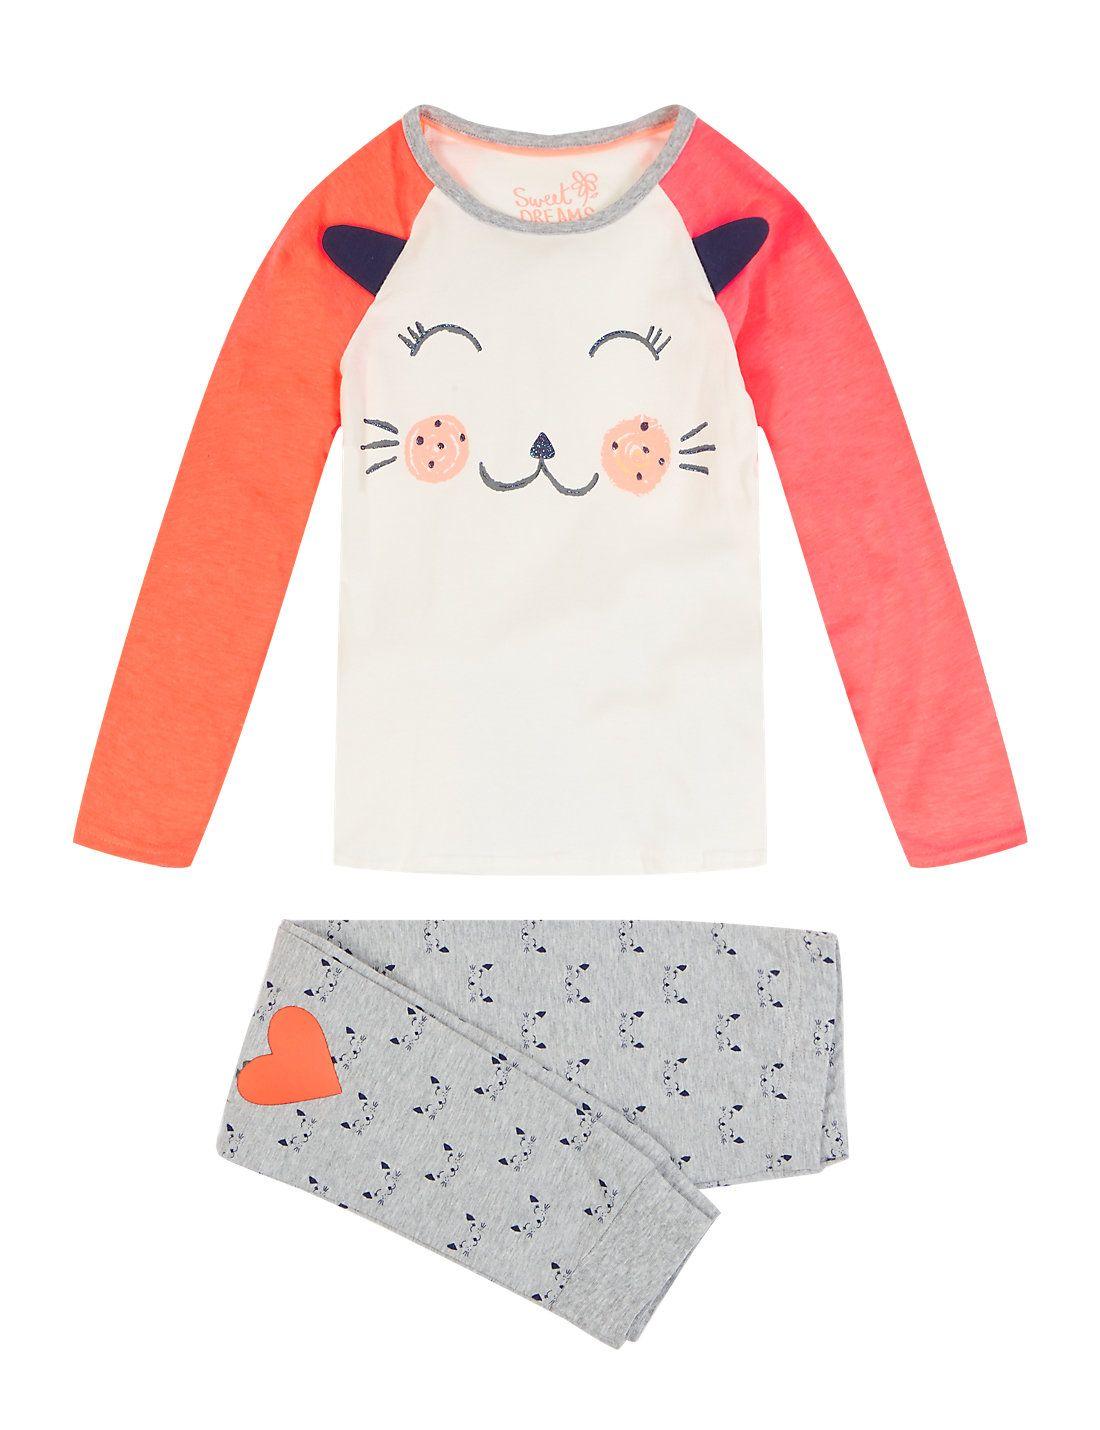 Pure Cotton Stay Soft Pyjamas (1-8 Years) | cocuk | Pinterest